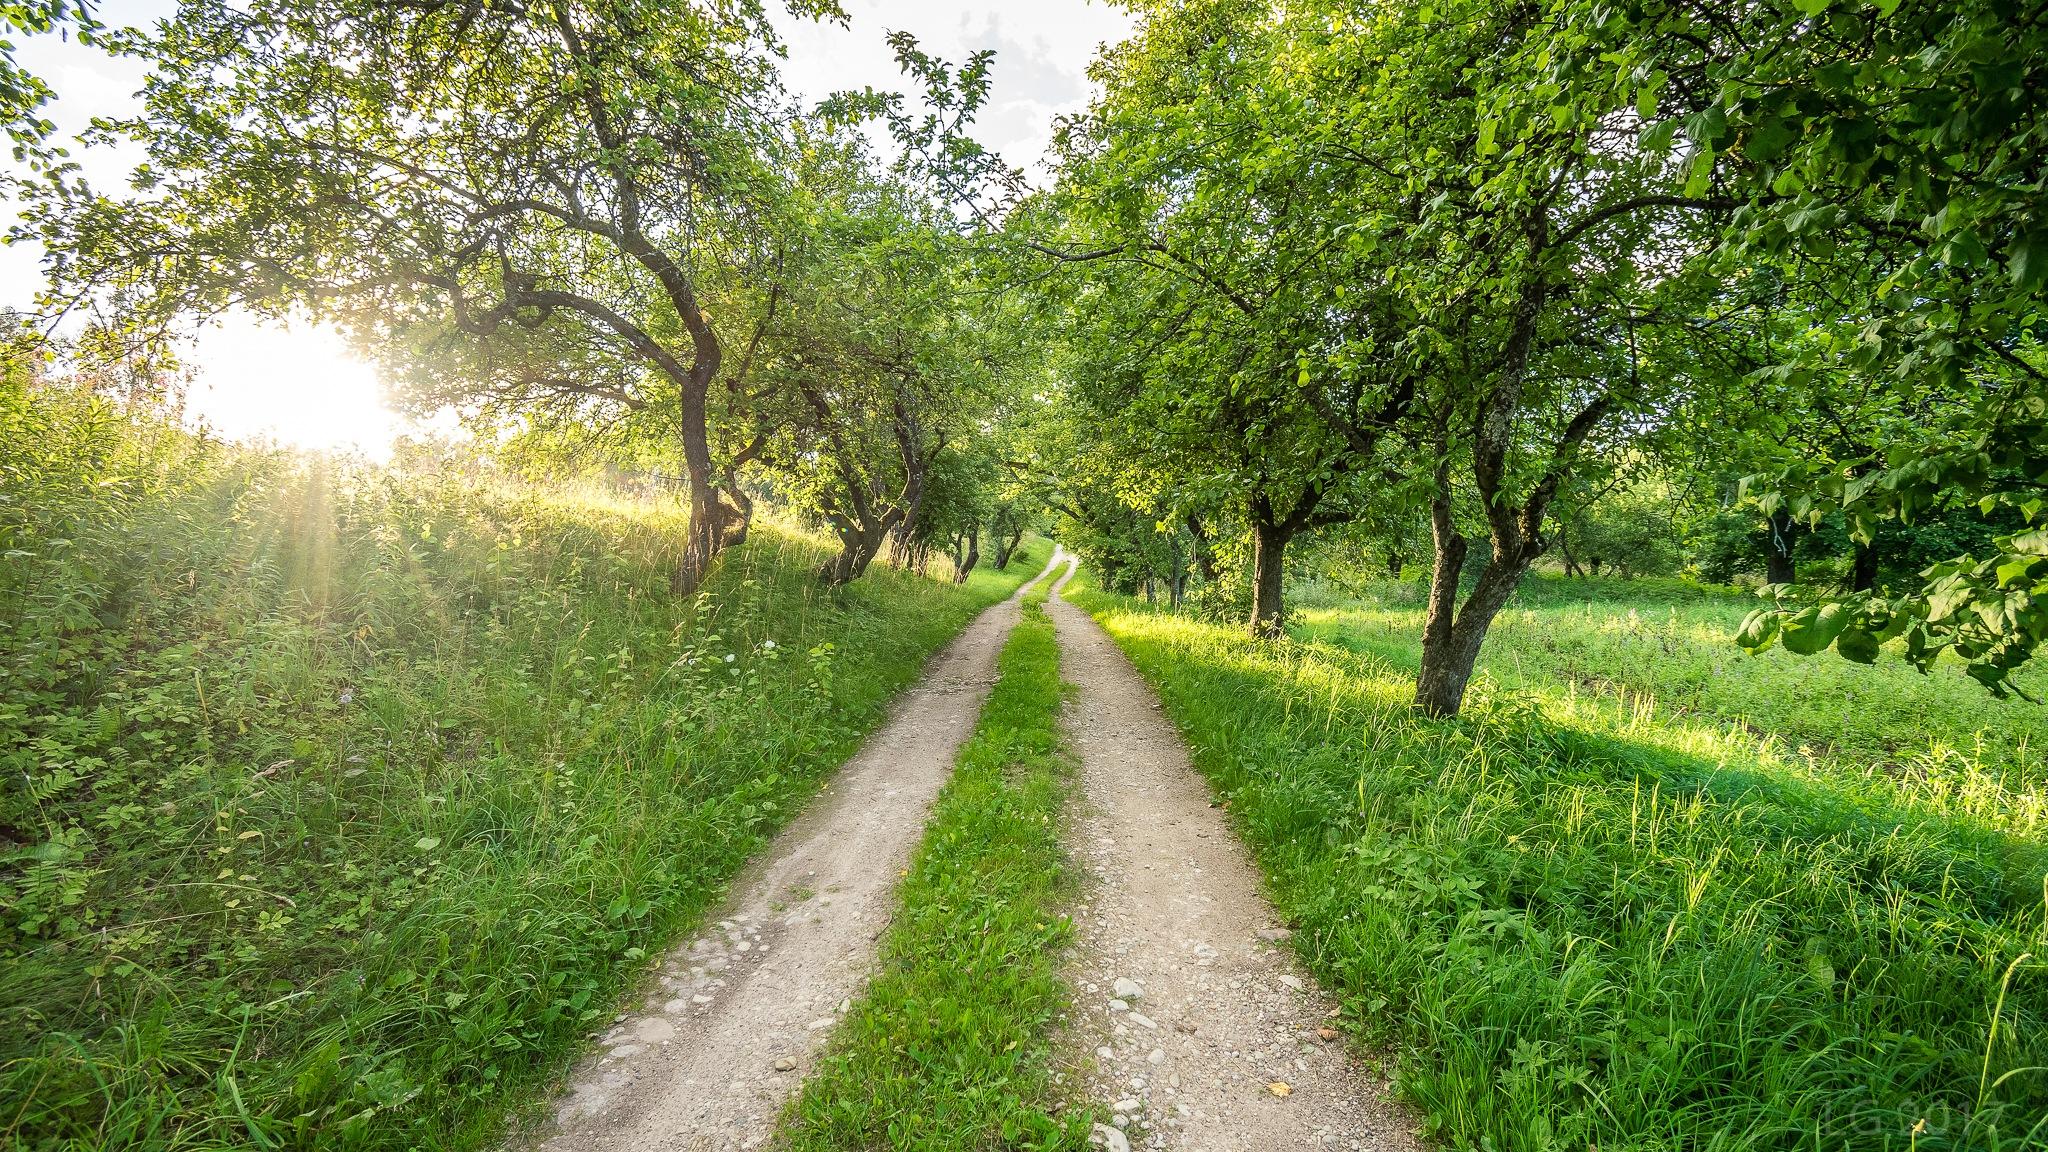 Path to Sunset by Linda Graholska